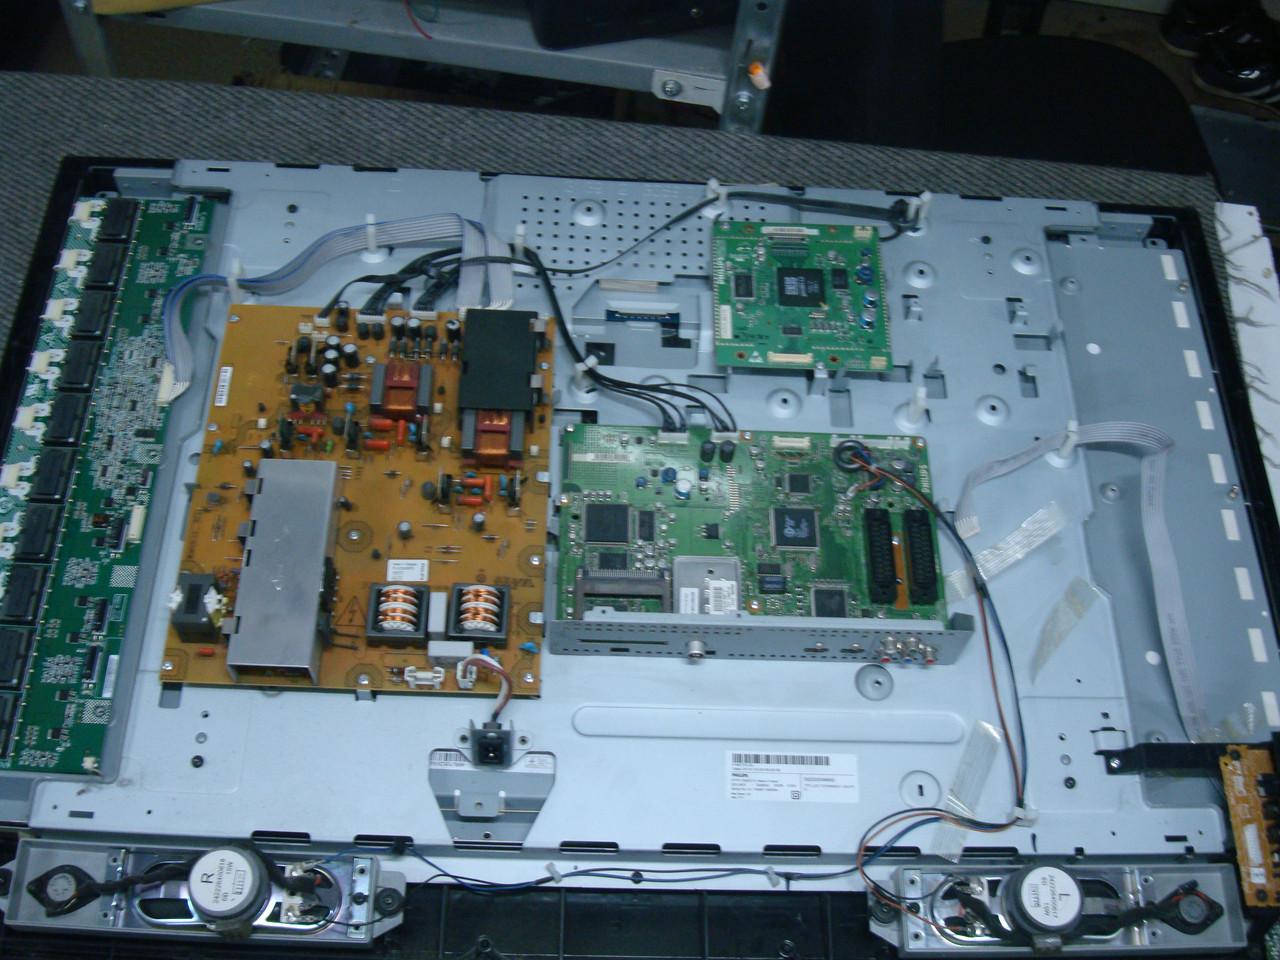 Запчасти к телевизору Philips 37PFL7662D (3139 123 62613 WK713.5, PLCD300P3 24573, T370HW02 V0), фото 1